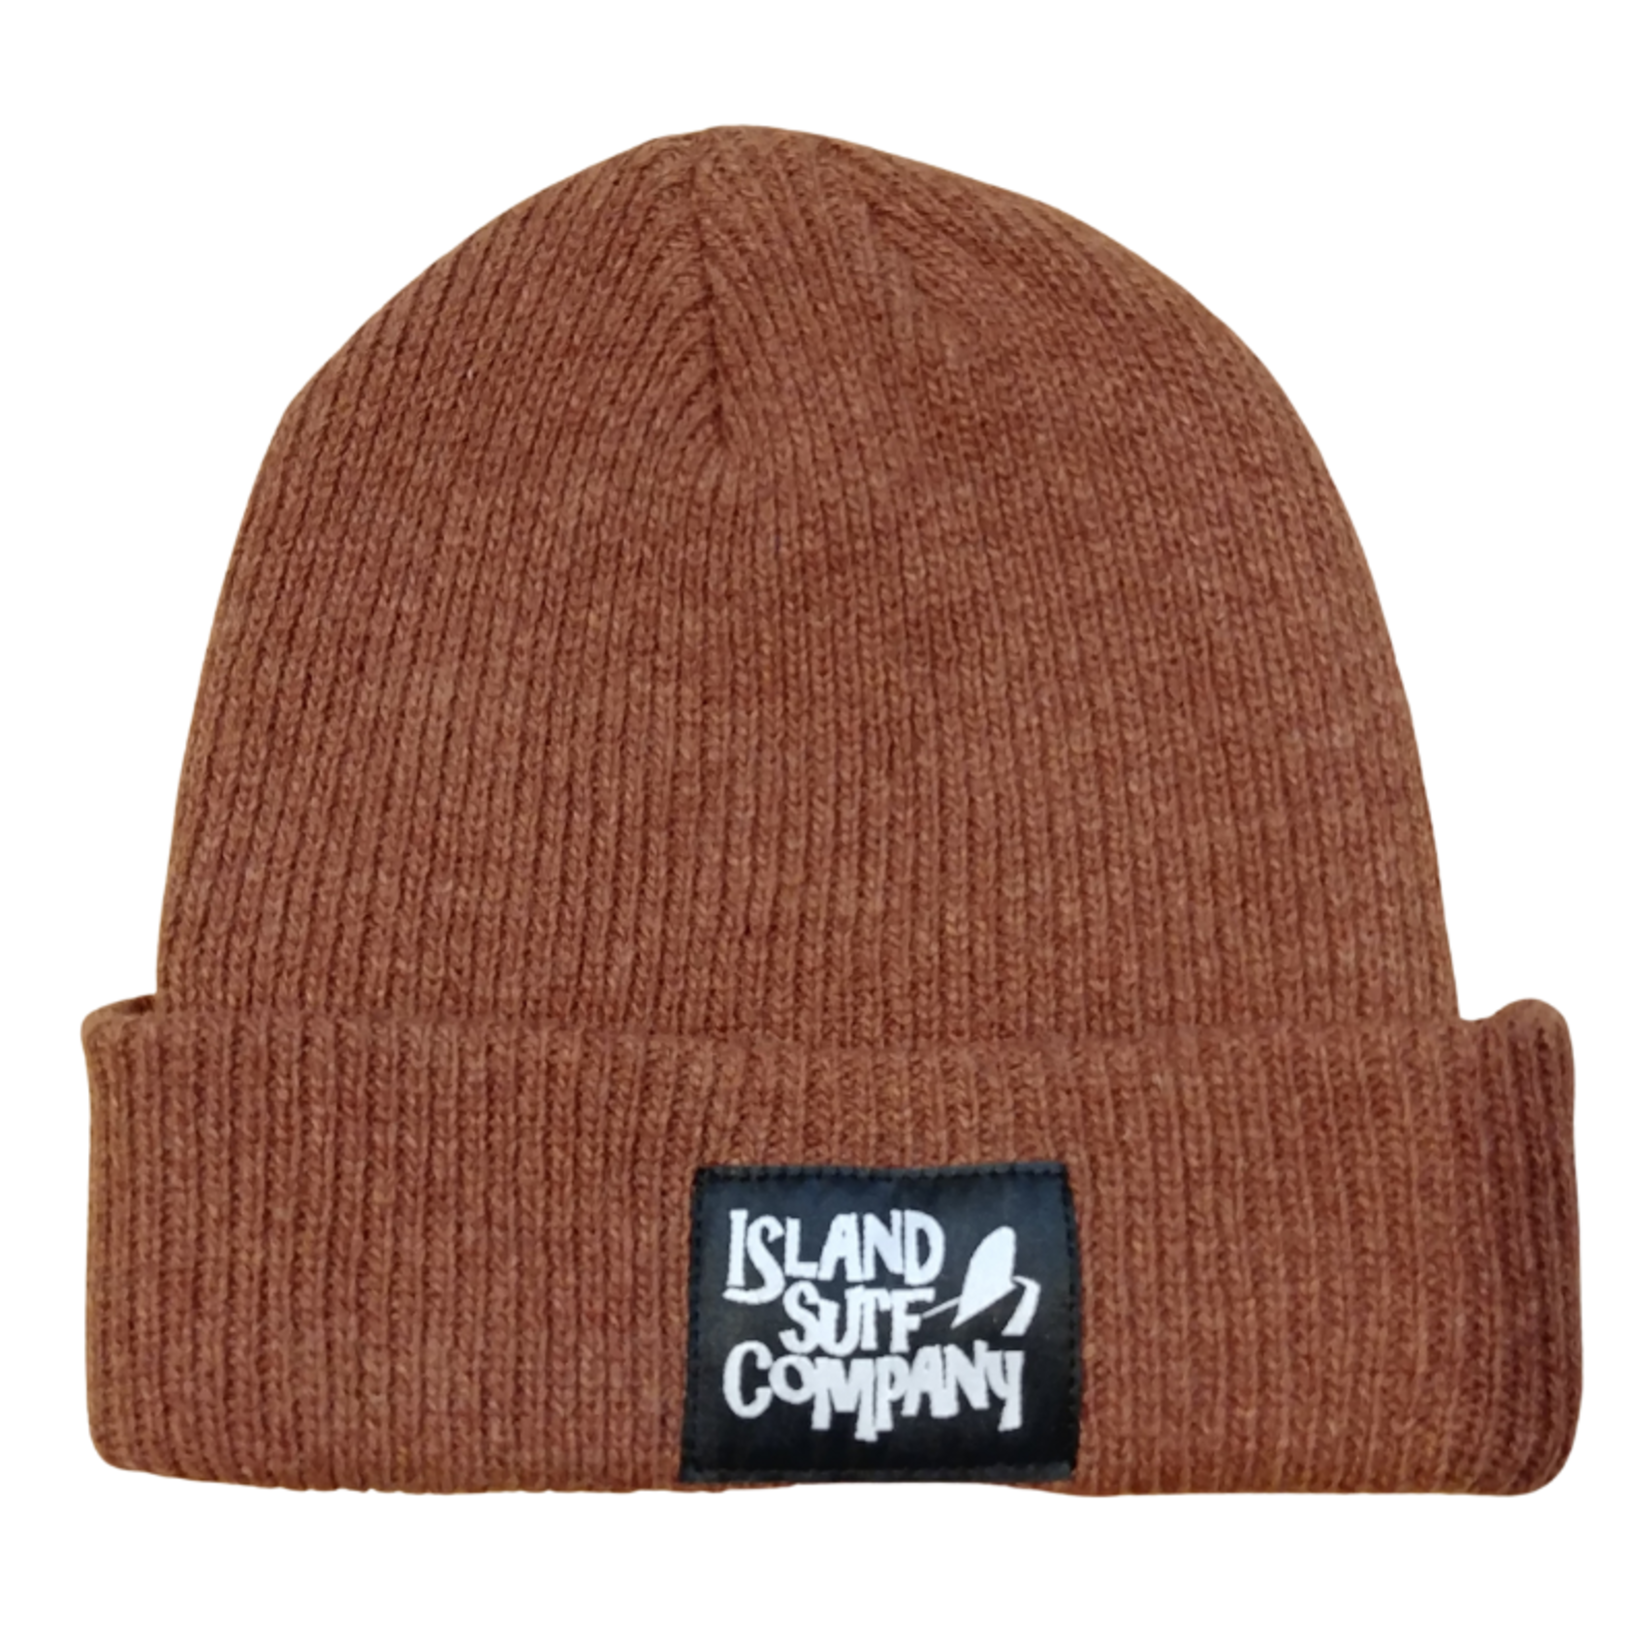 Island Surf Company Merino Wool Patch Logo Beanie.